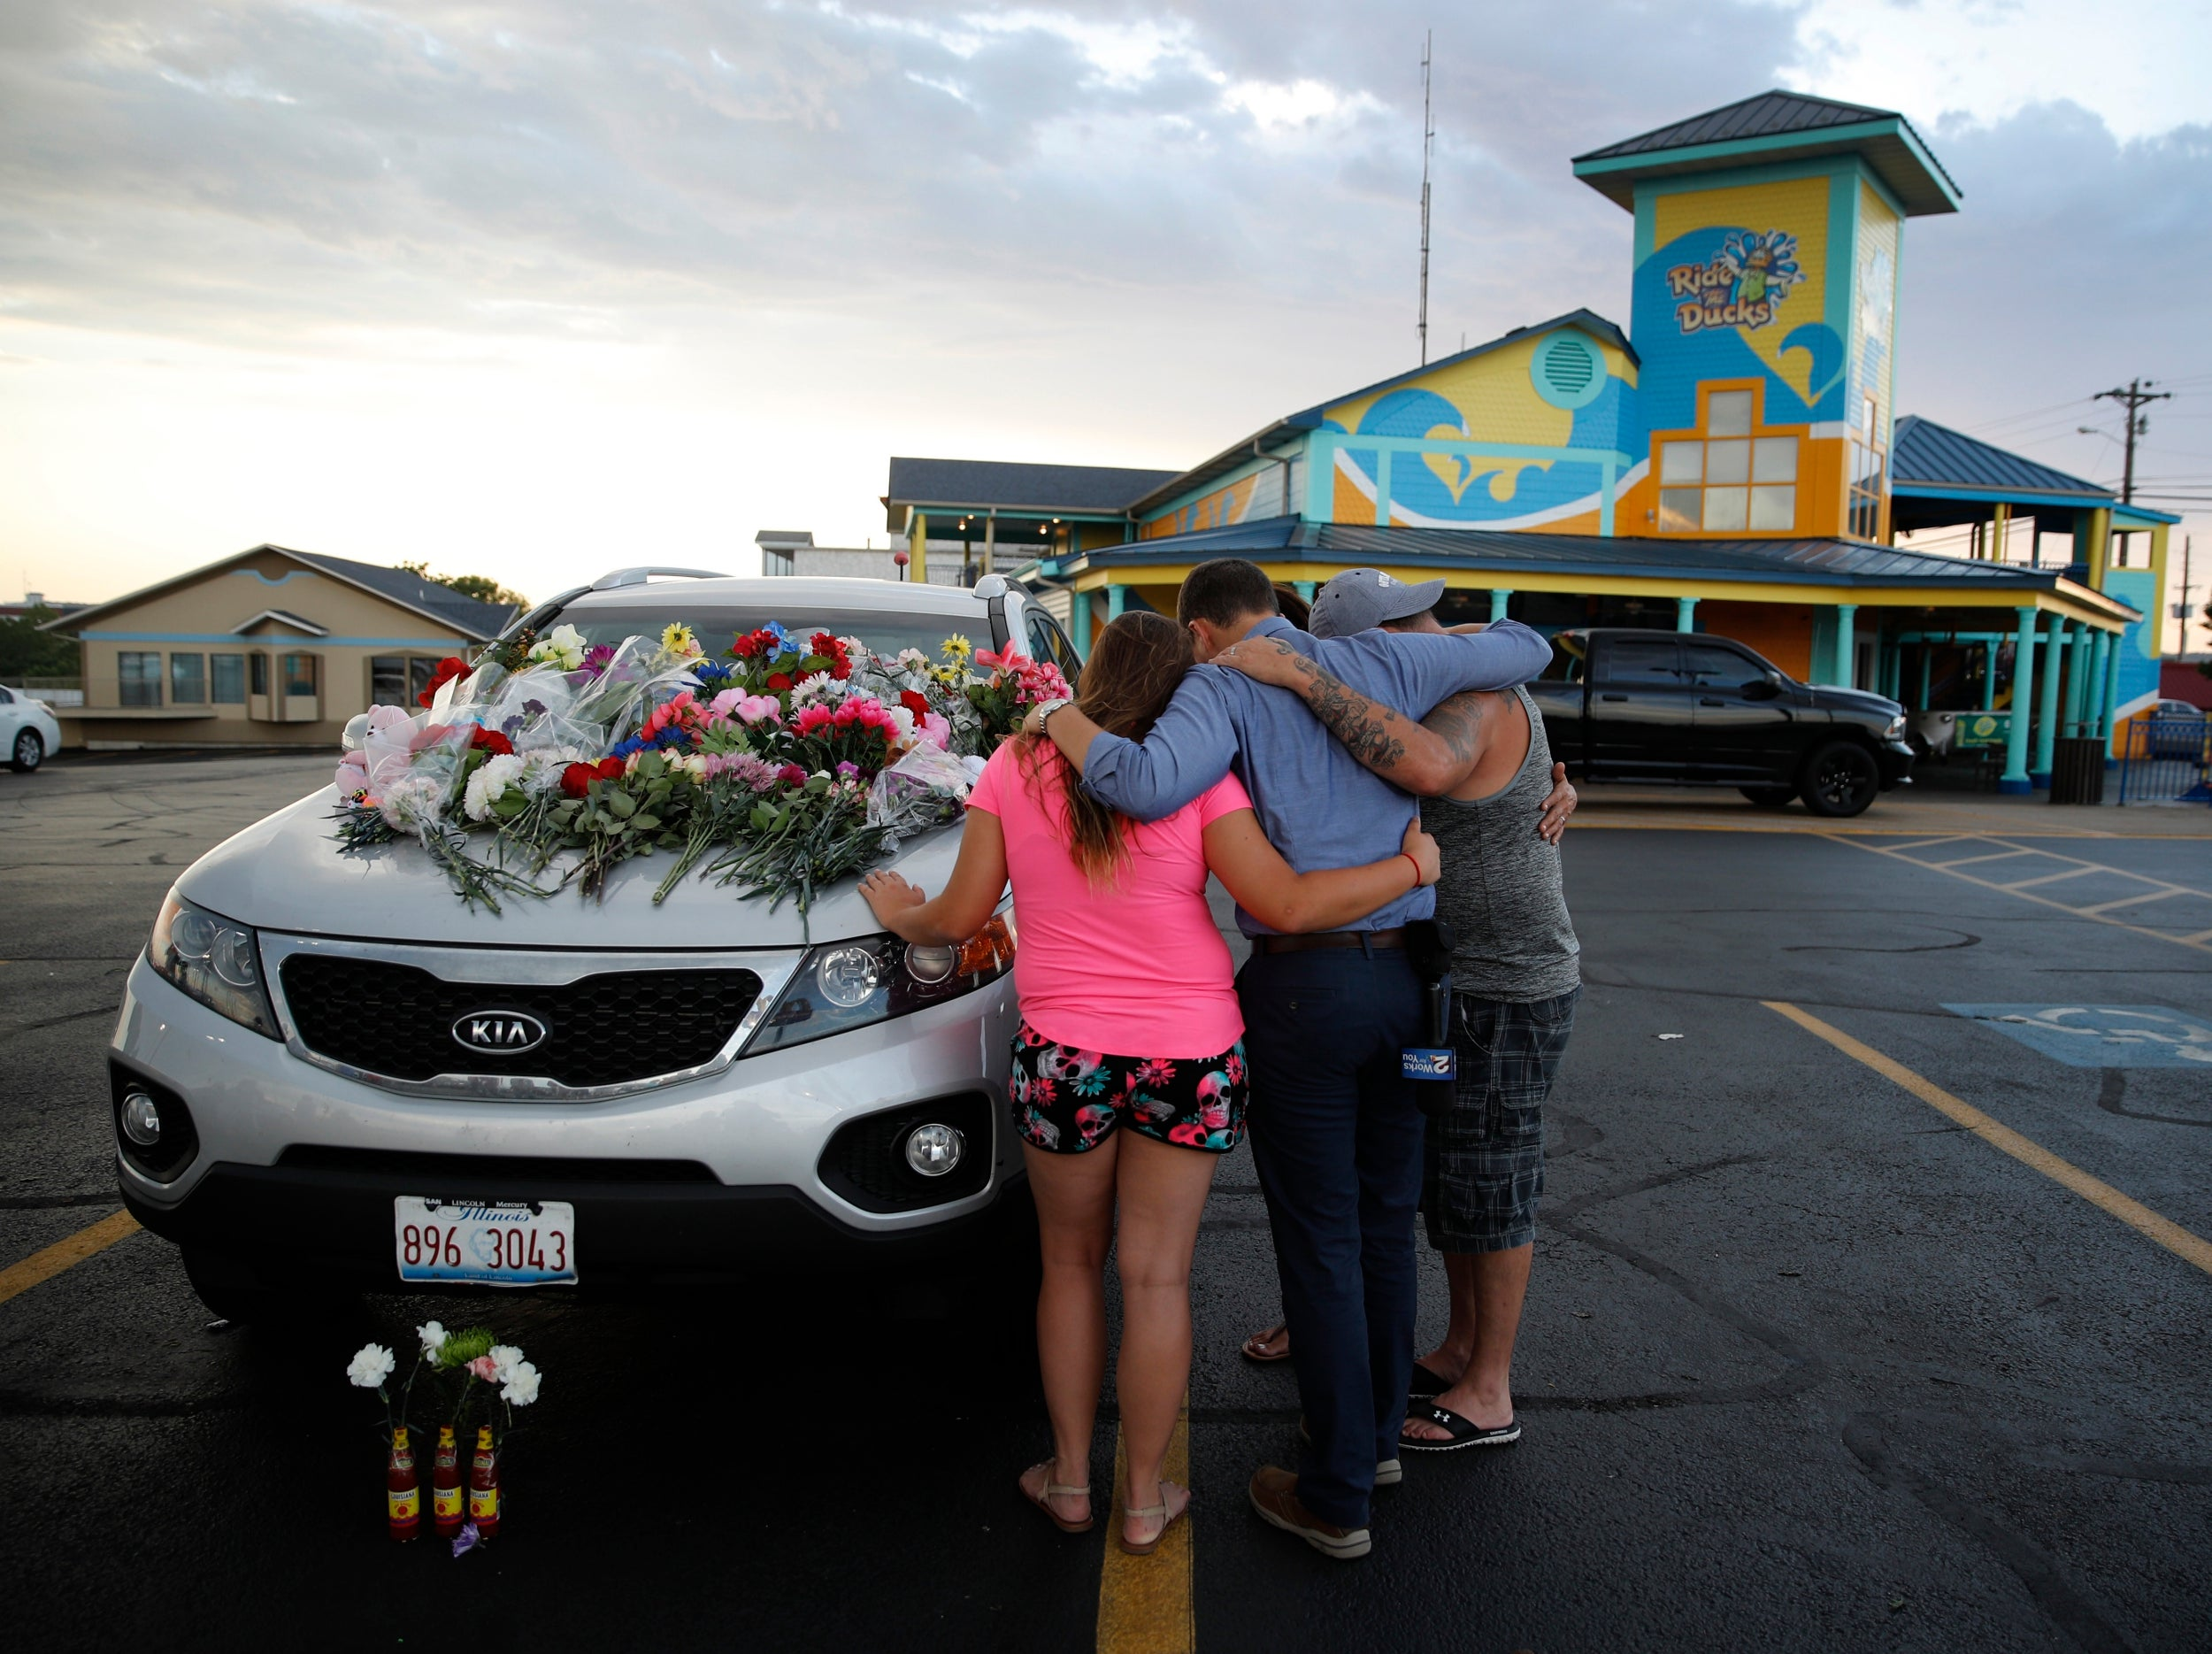 Missouri boat crash: 17 dead - 9 from the same family